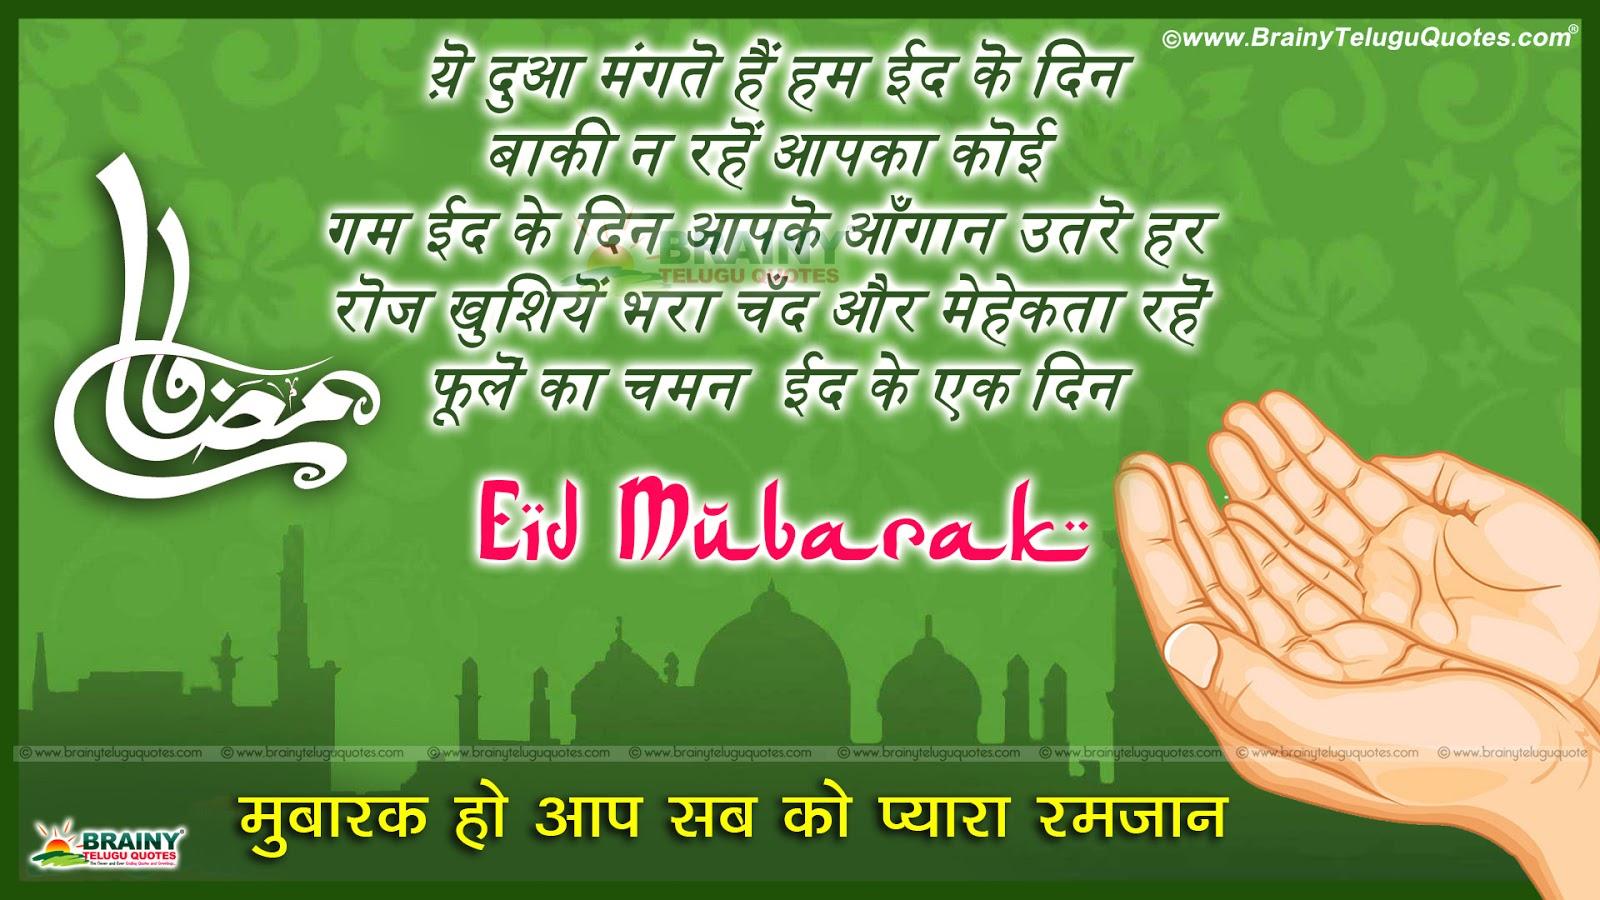 Hindi eid mubarak quotes and greetings new brainyteluguquotes free eid mubarak quotes for friends happy ramadan 2016 quotes online happy ramadan greetings kristyandbryce Choice Image